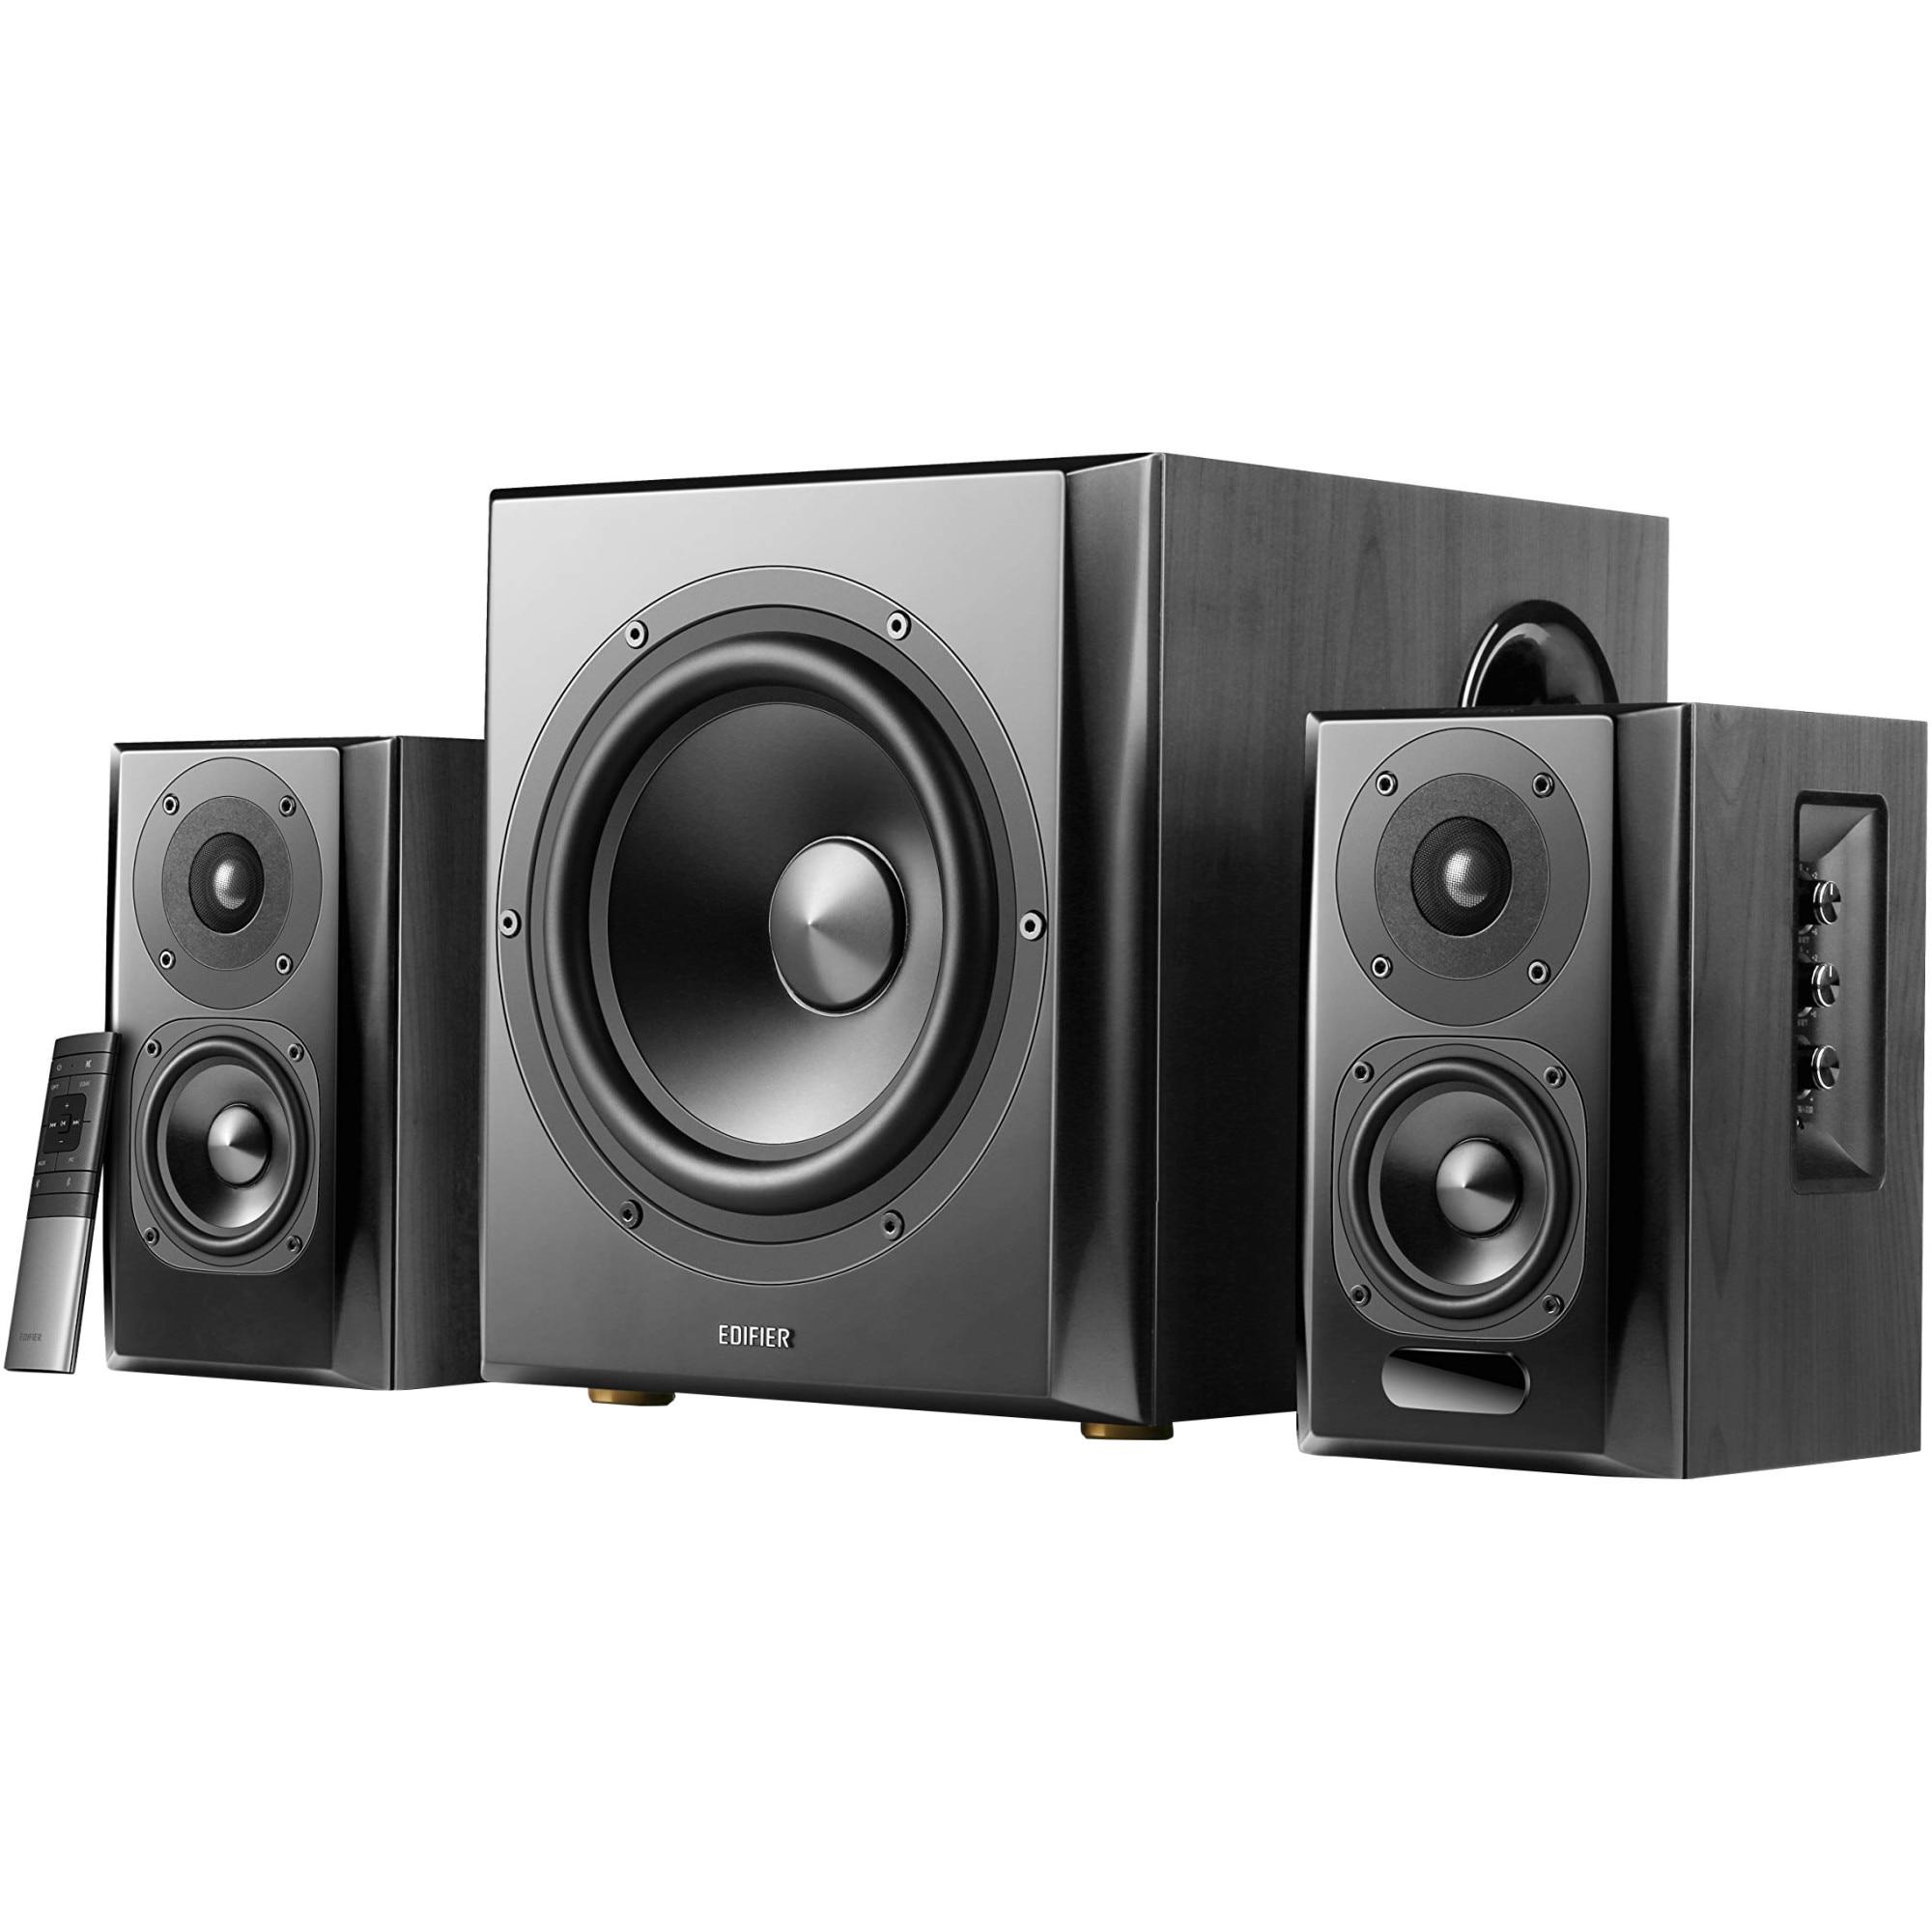 Fotografie Boxe Edifier 2.1 S351DB-BK, 150W, Bluetooth, Telecomanda, Negru